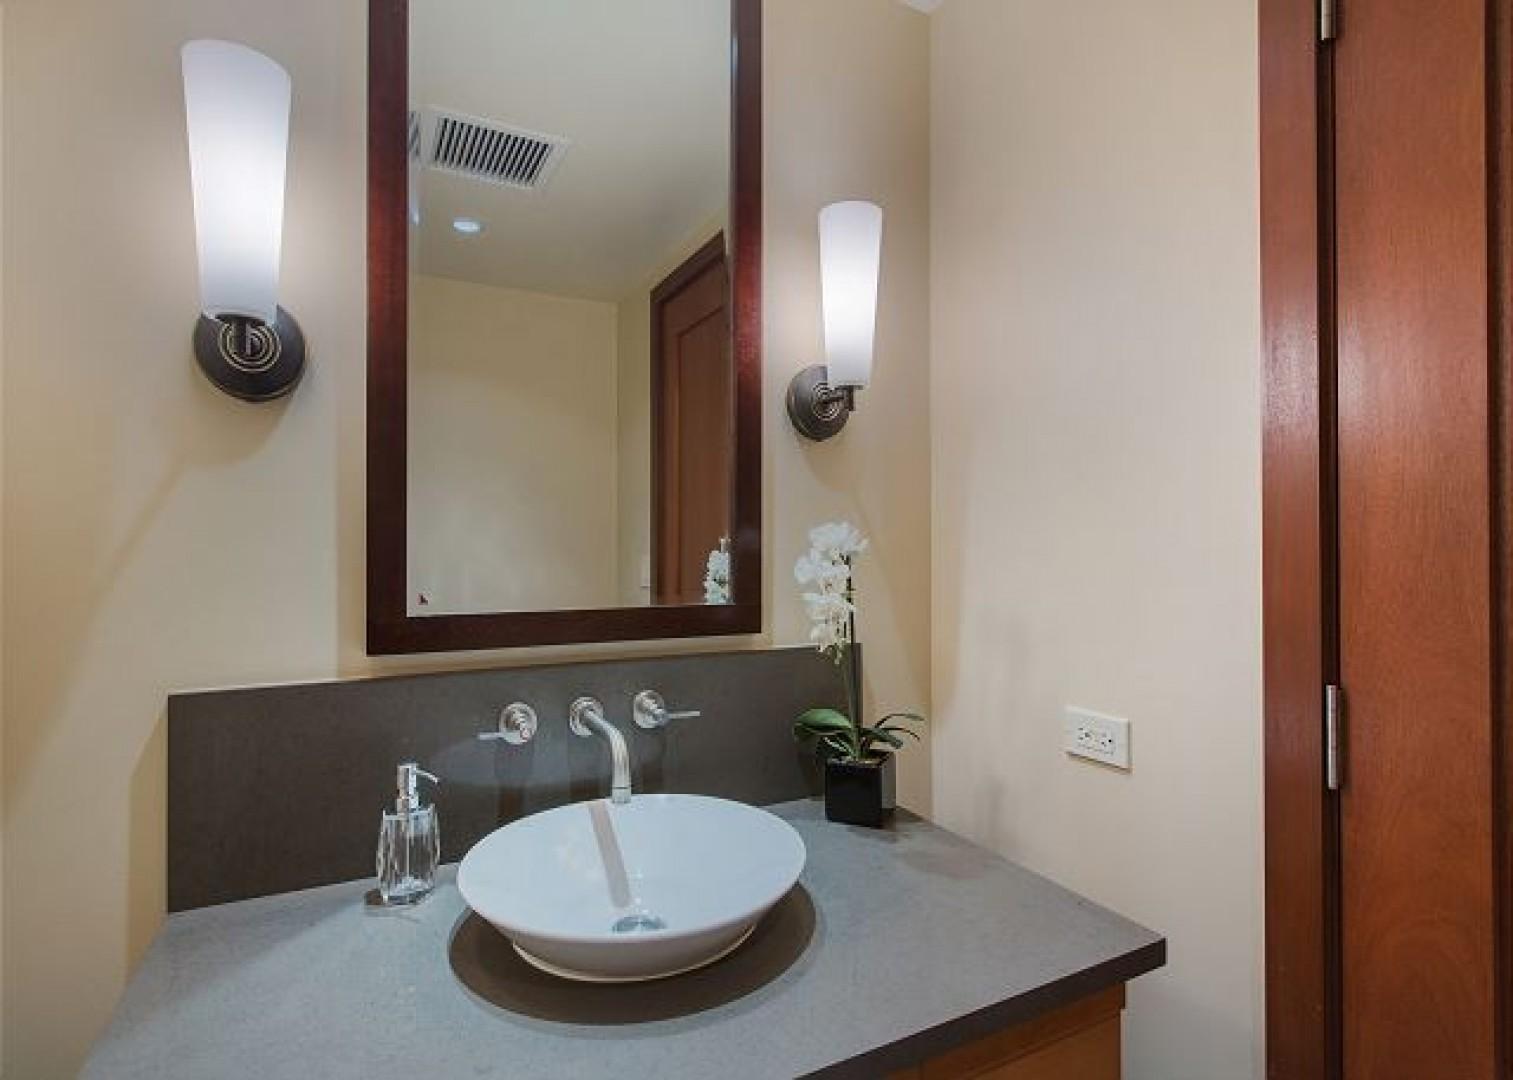 3rd Bathroom has a showe